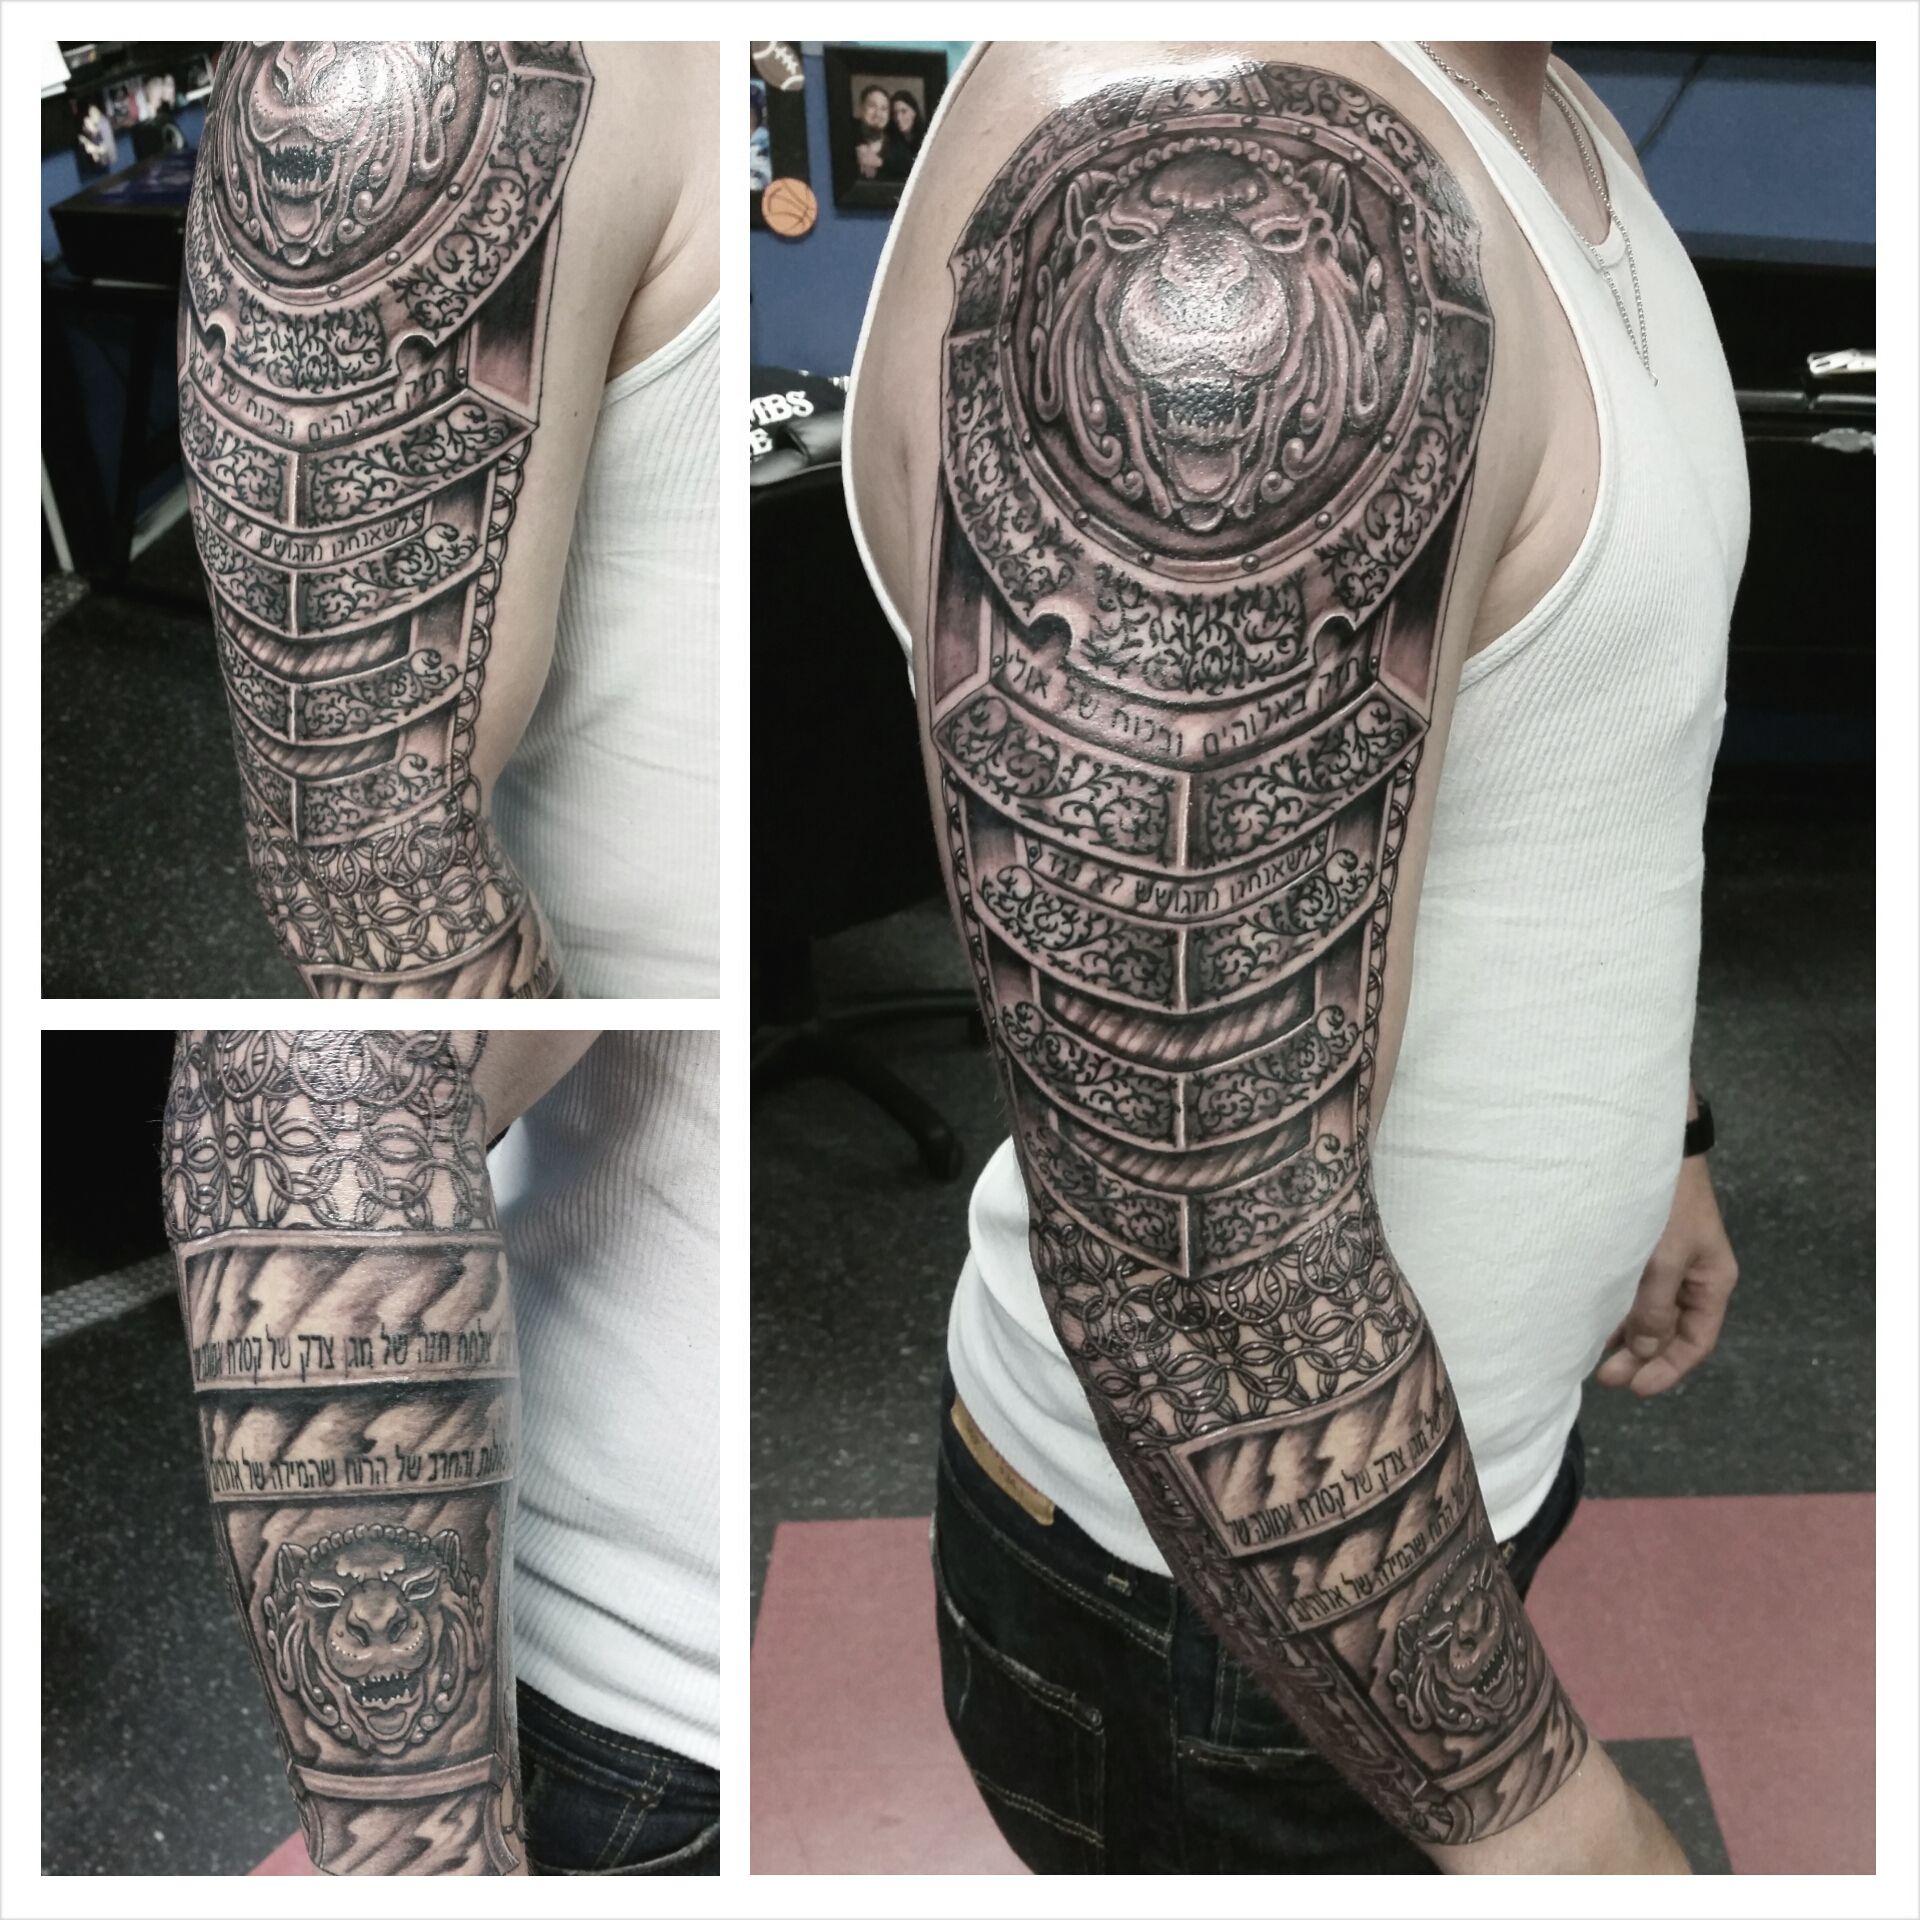 Armor Tattoo Armor Sleeve Tattoo Boneface Ink Ink ...